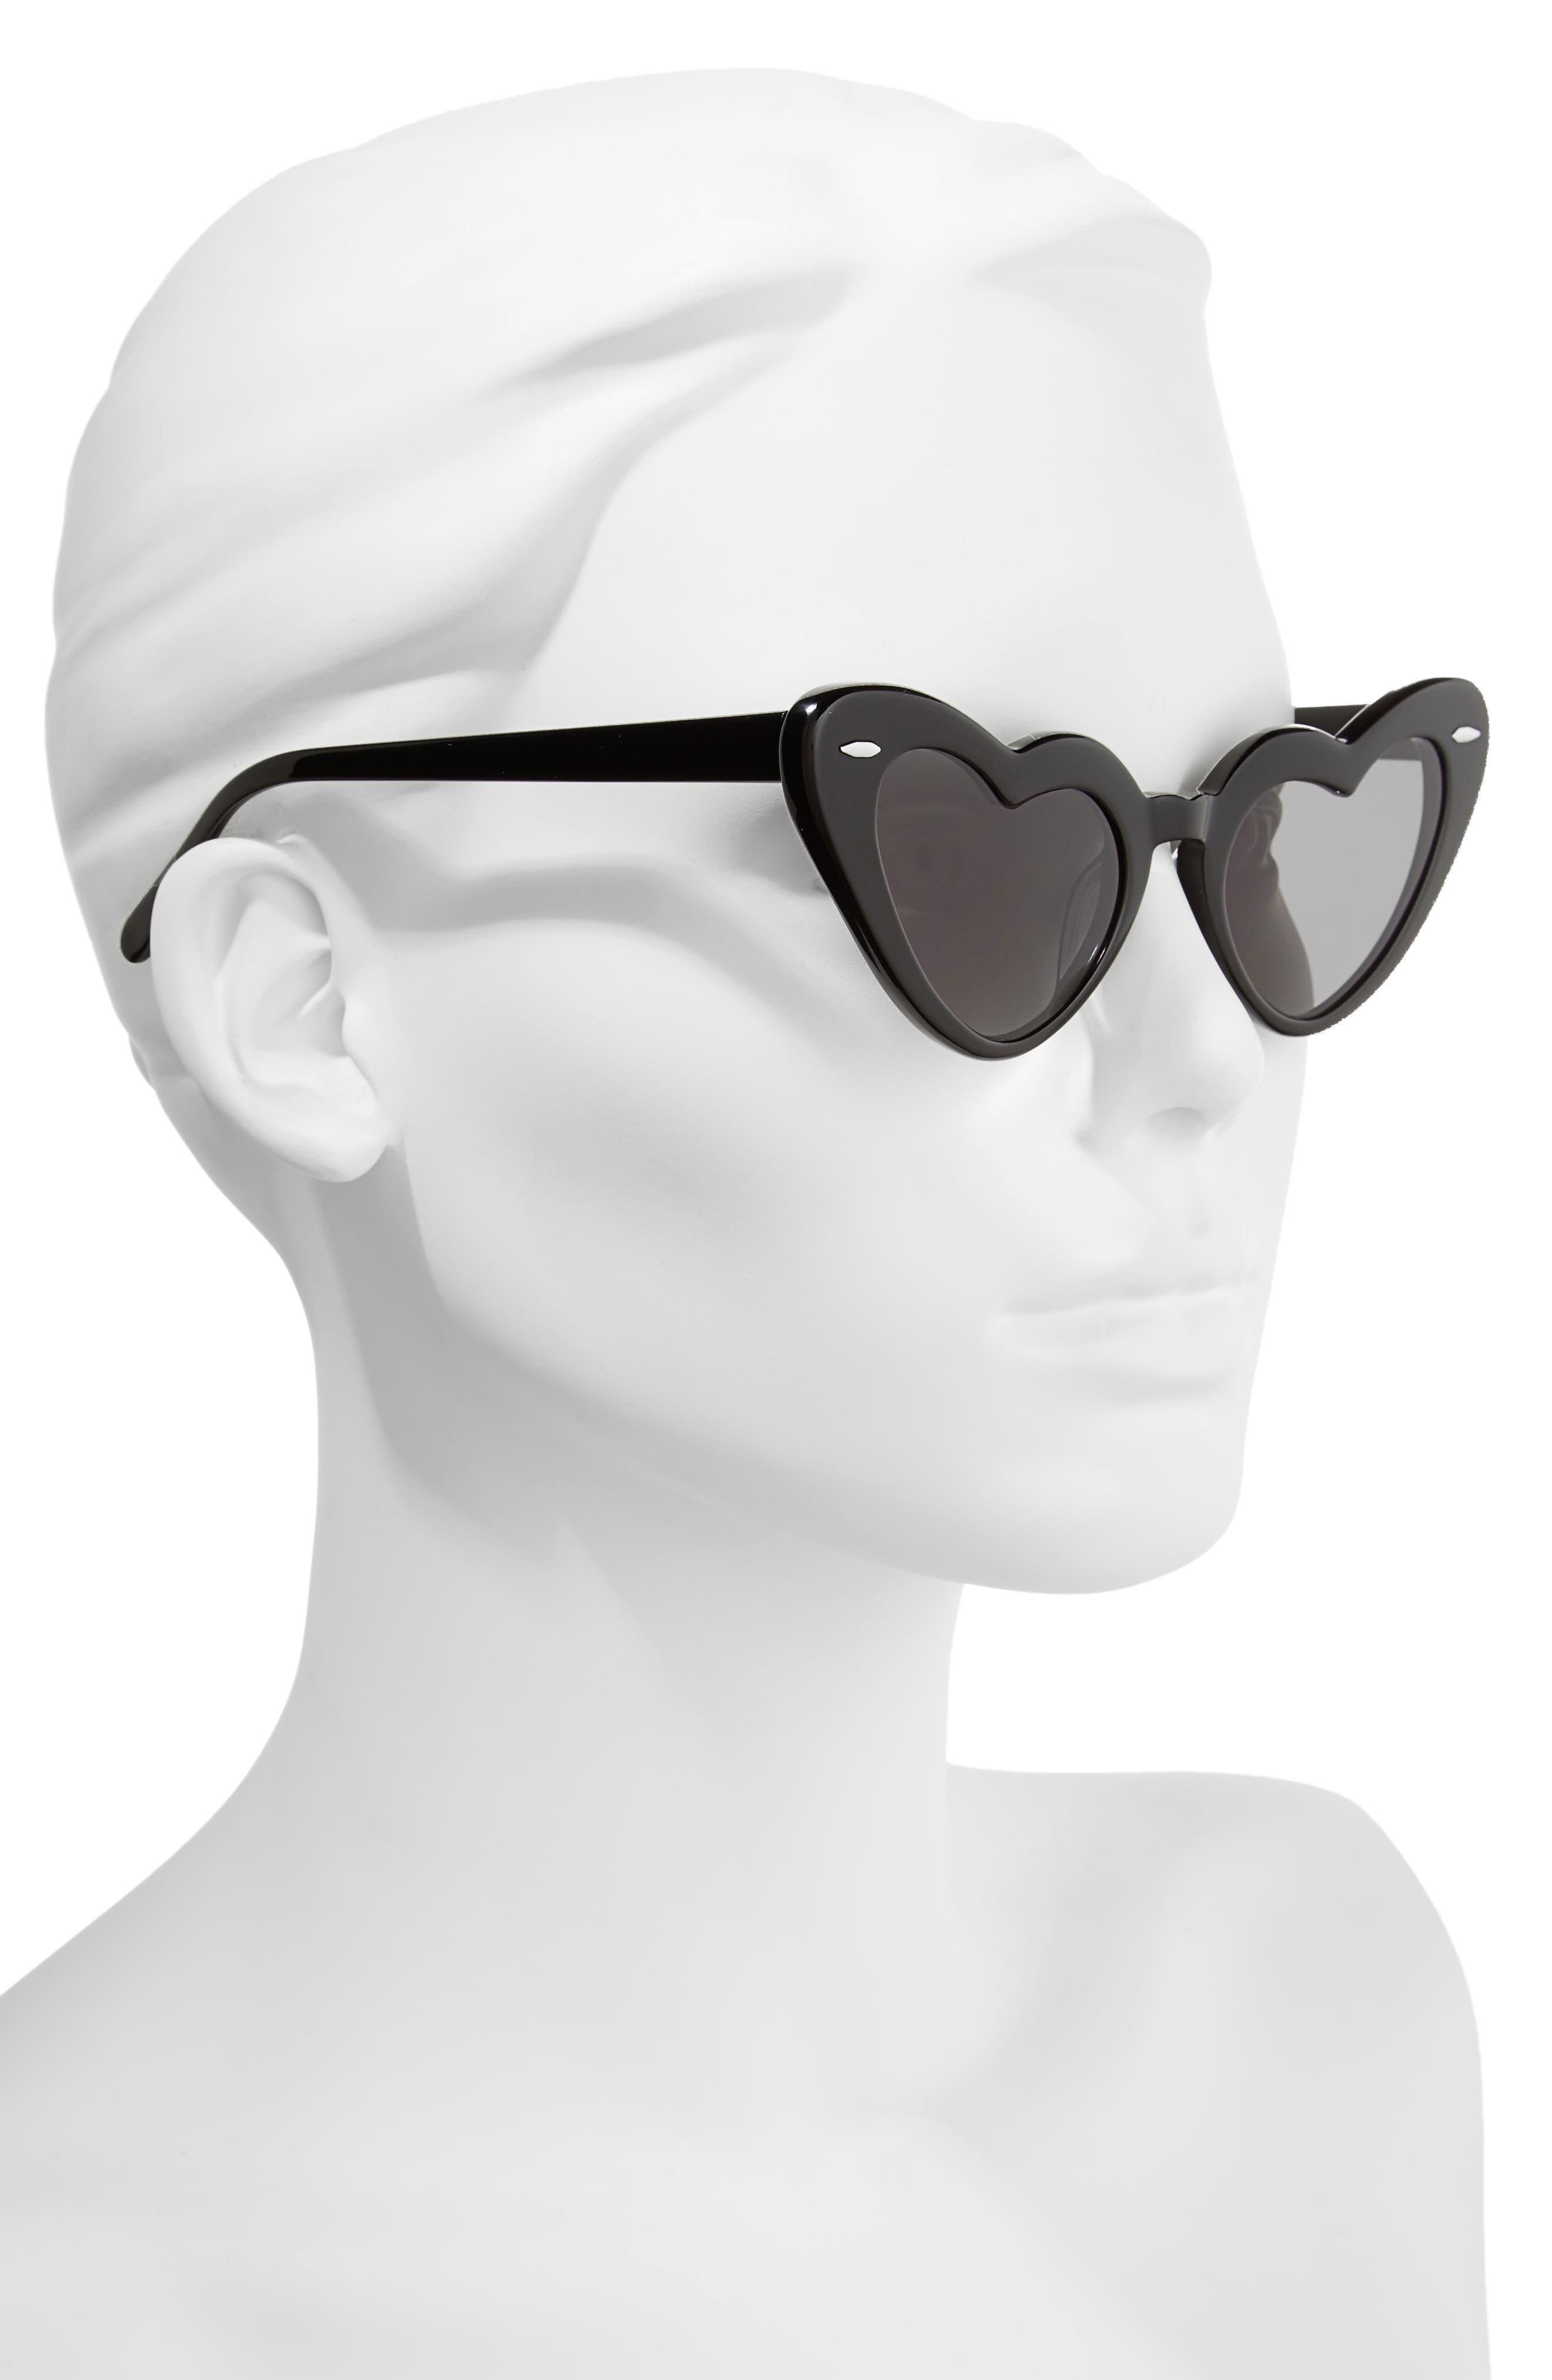 J'adore 46mm Heart Sunglasses,                             Alternate thumbnail 2, color,                             001